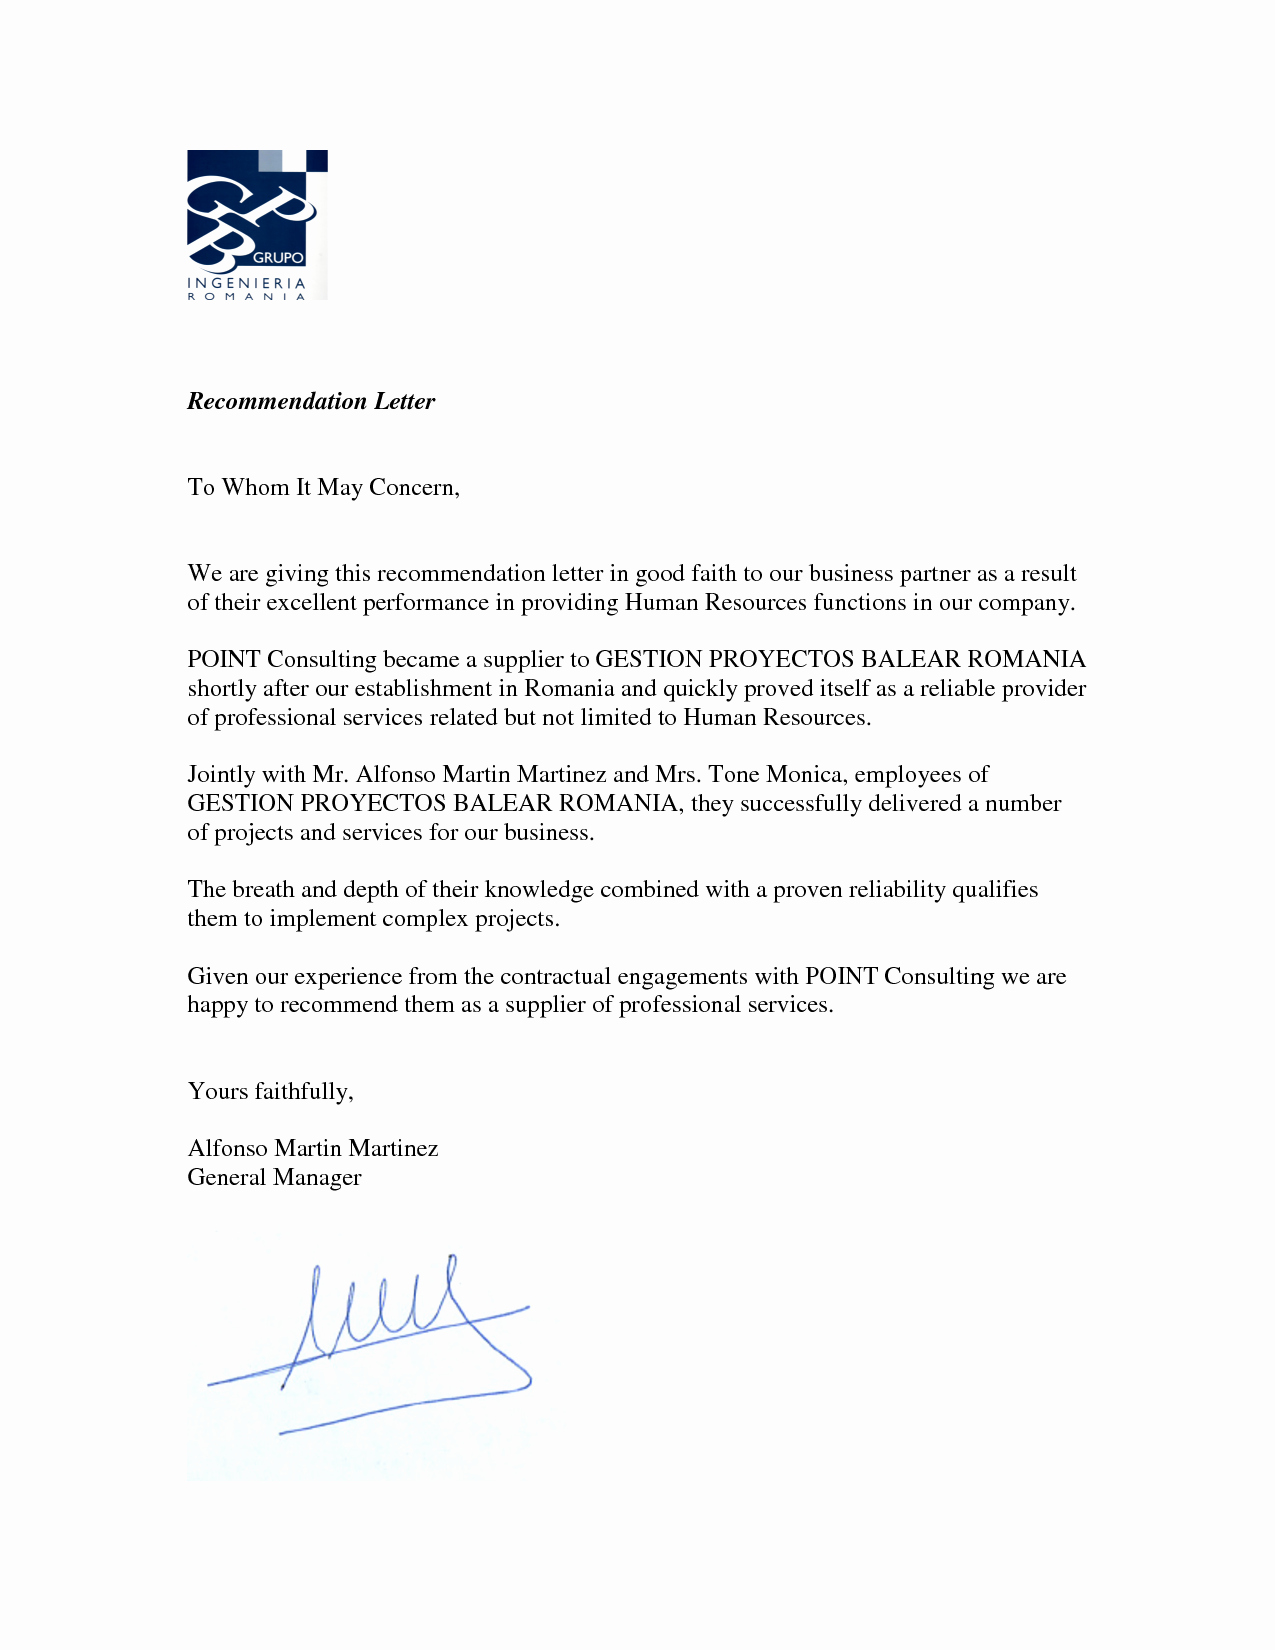 Vendor Recommendation Letter Sample Awesome Best S Of Free Sample Business Letter